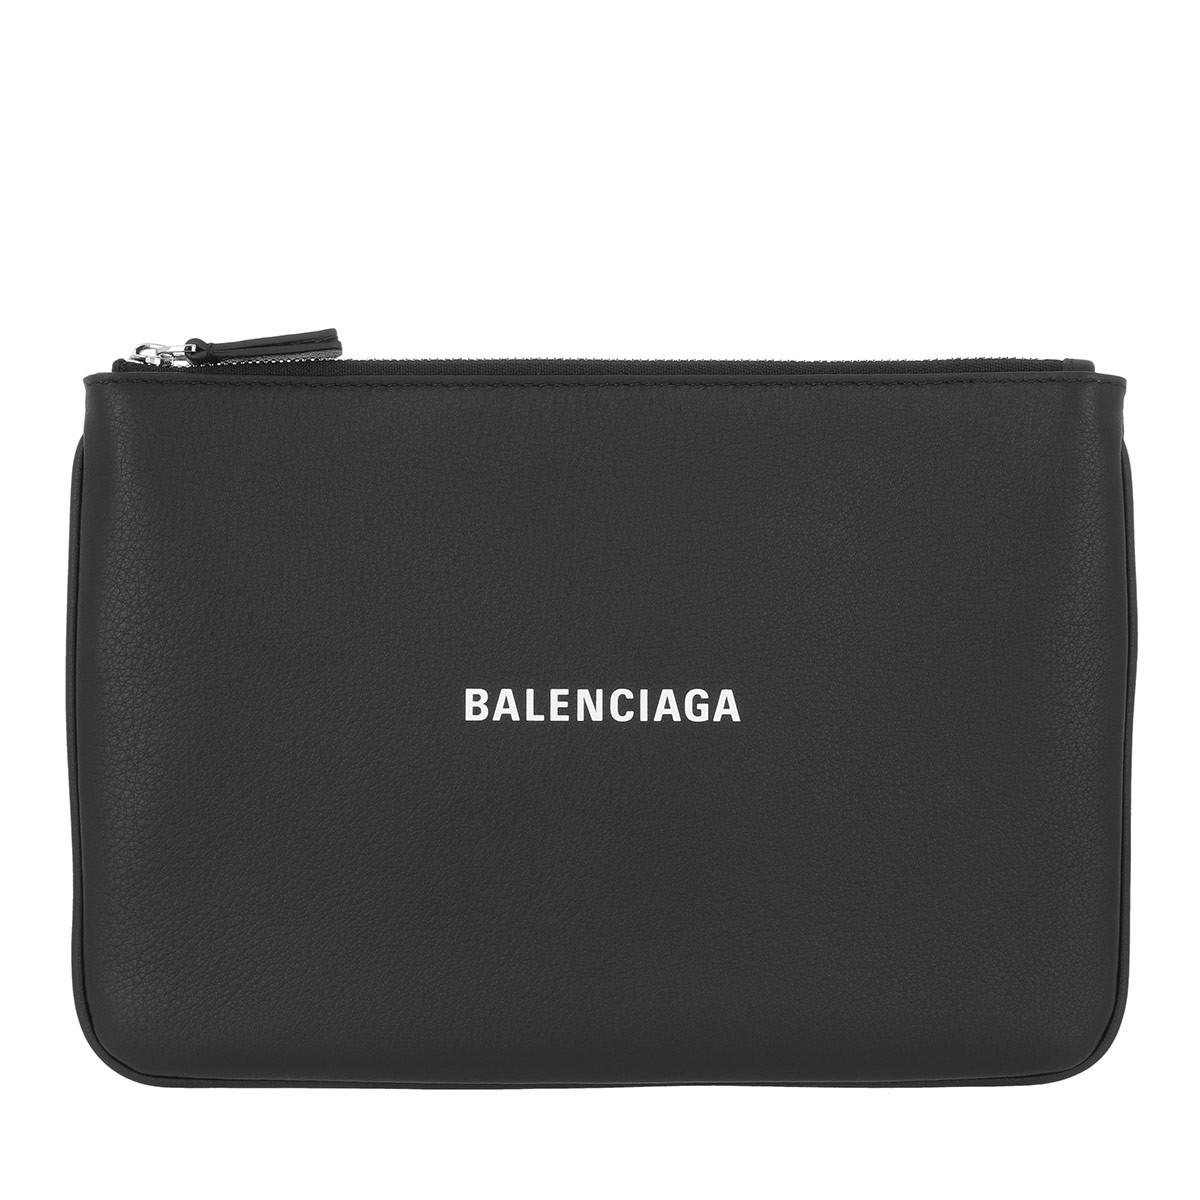 Balenciaga Clutch - Logo Clutch Black - in schwarz - für Damen